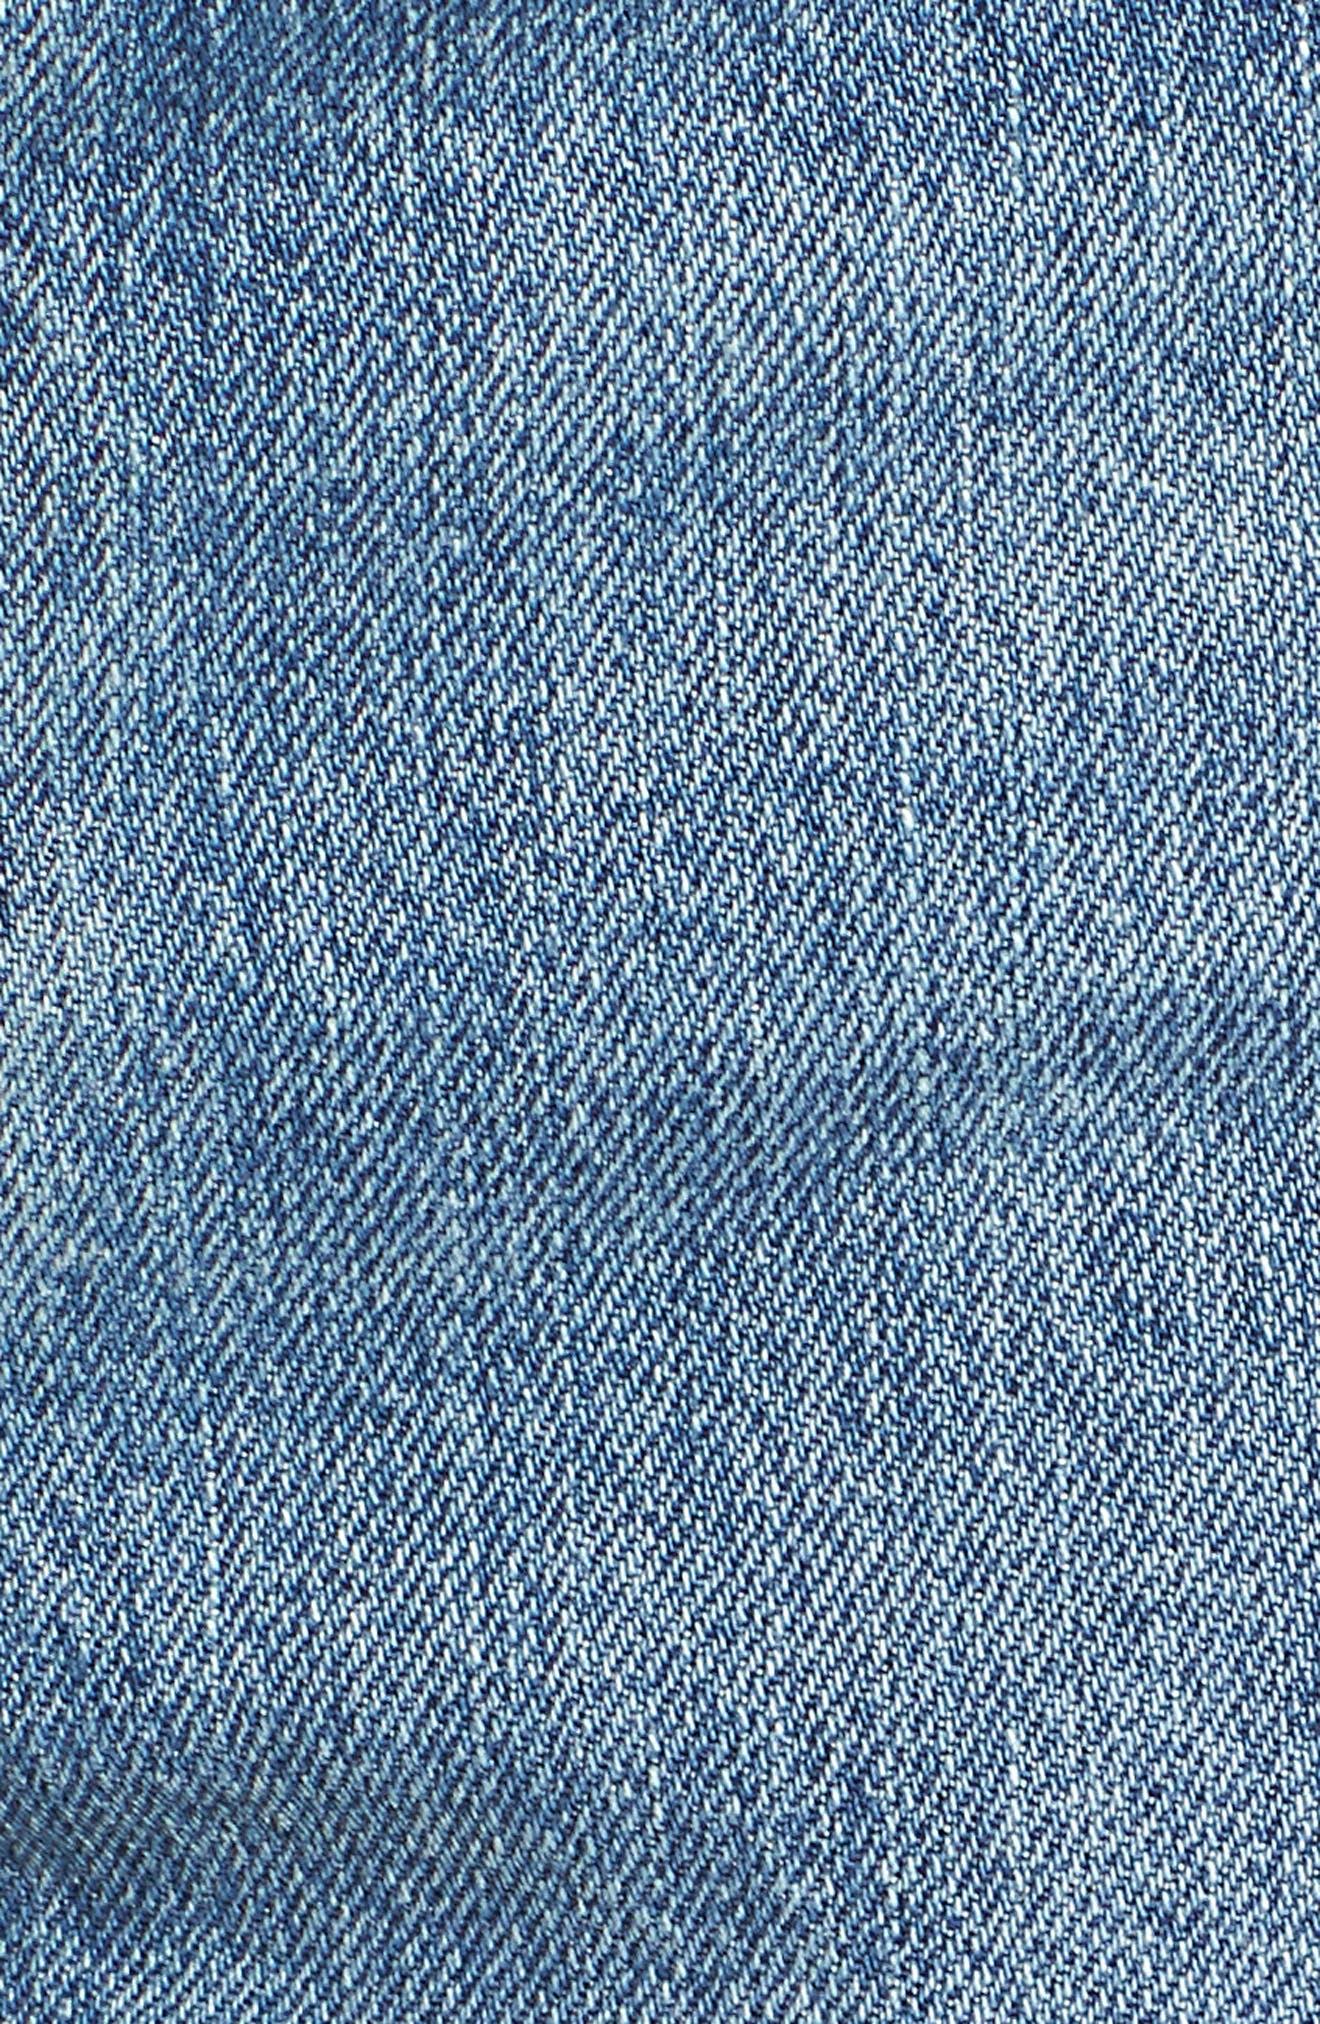 Wedgie High Waist Cutoff Denim Shorts,                             Alternate thumbnail 6, color,                             BLUE YOUR MIND